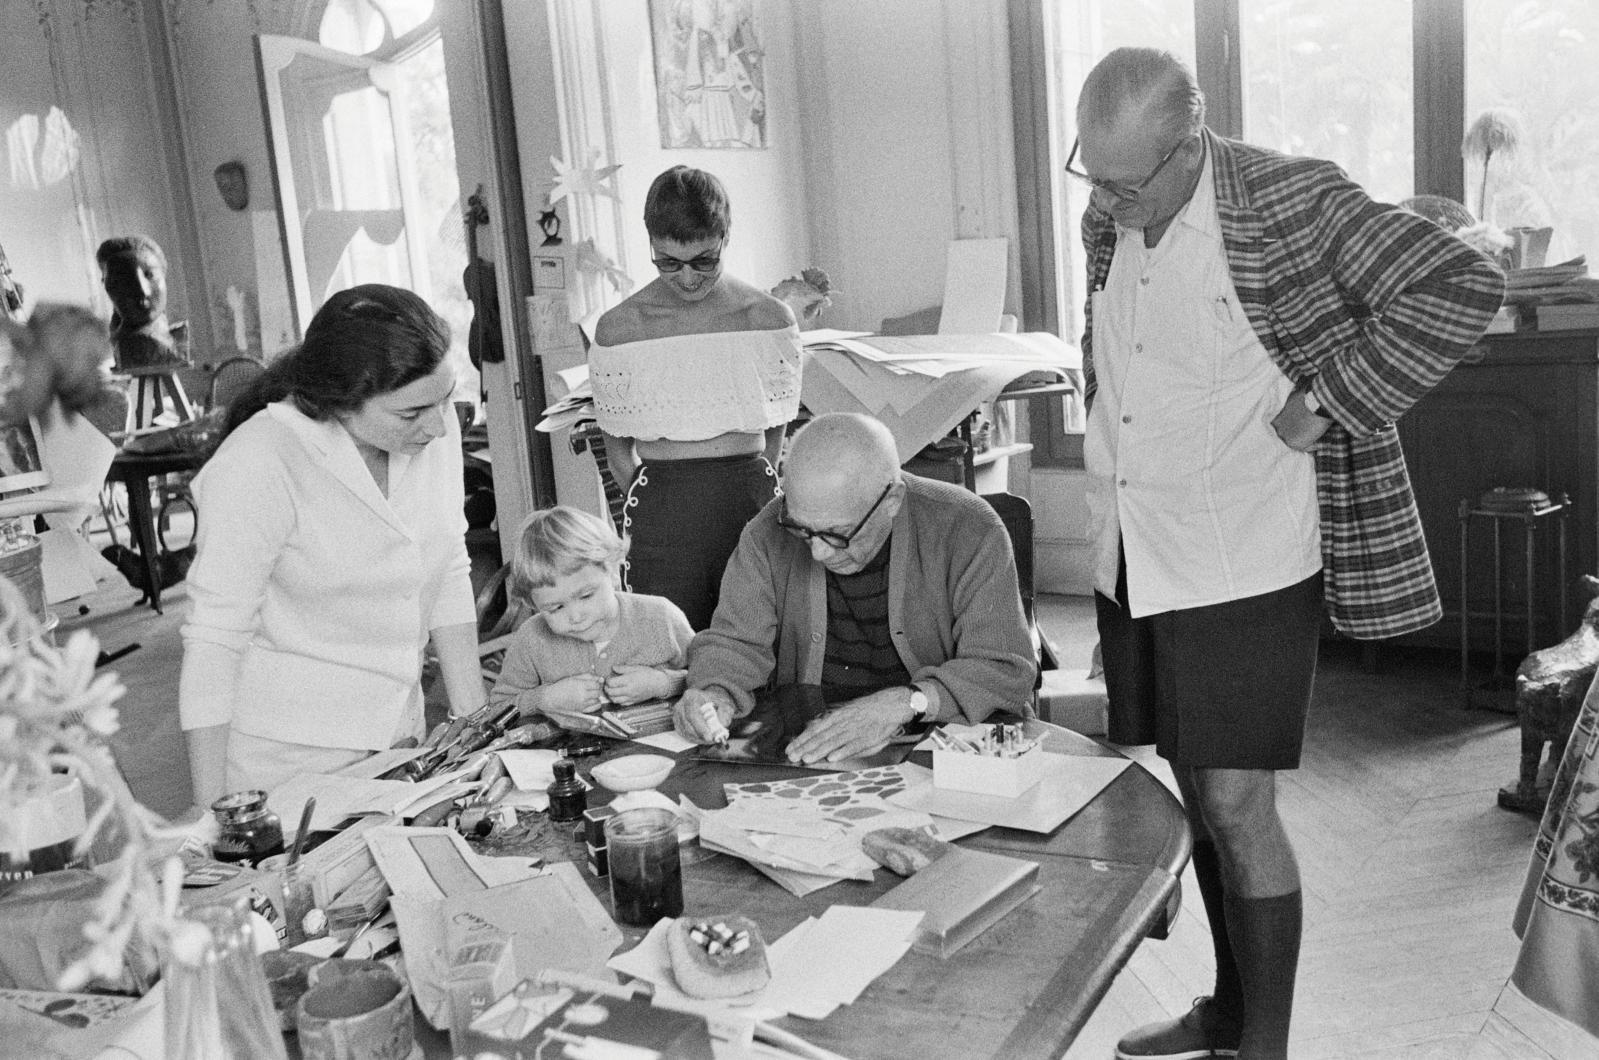 Jacqueline Roque, Marie et Ulla Ahrenberg, Picassoet Theodor Arhenberg à la Californie, Cannes, 1959.